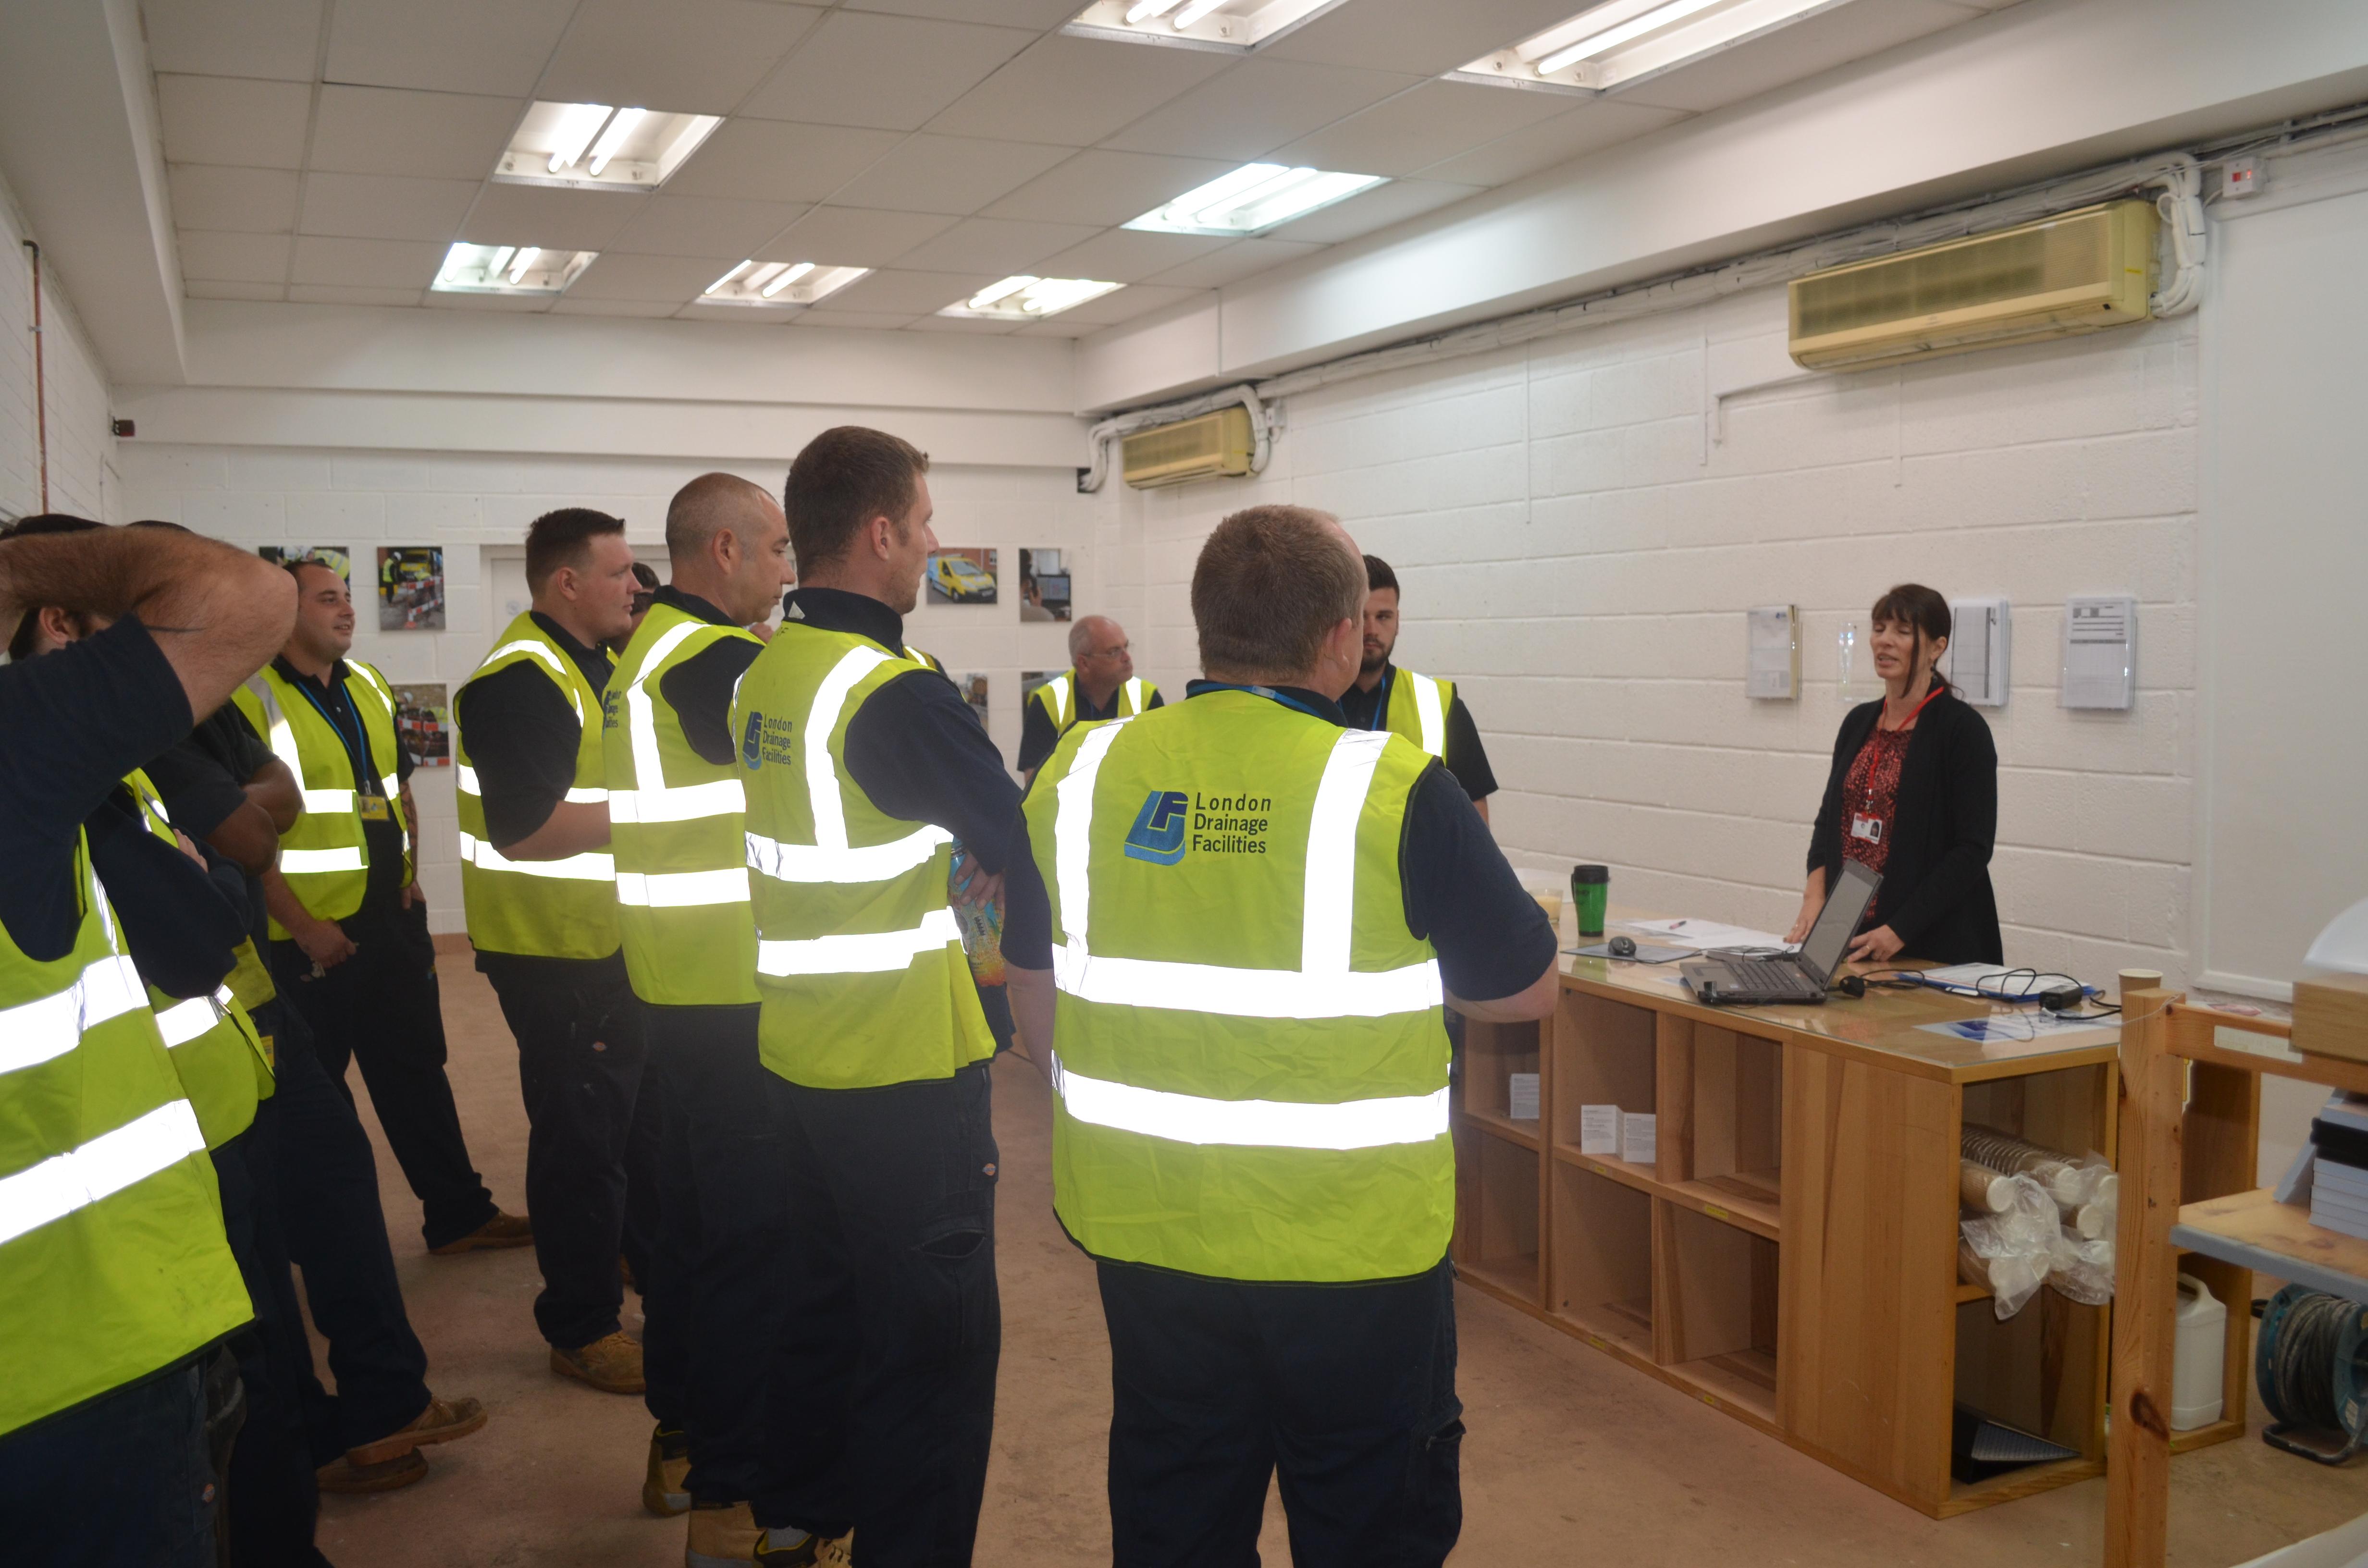 London Drainage Services: London Drainage Facilities' Engineers Undergo Intensive